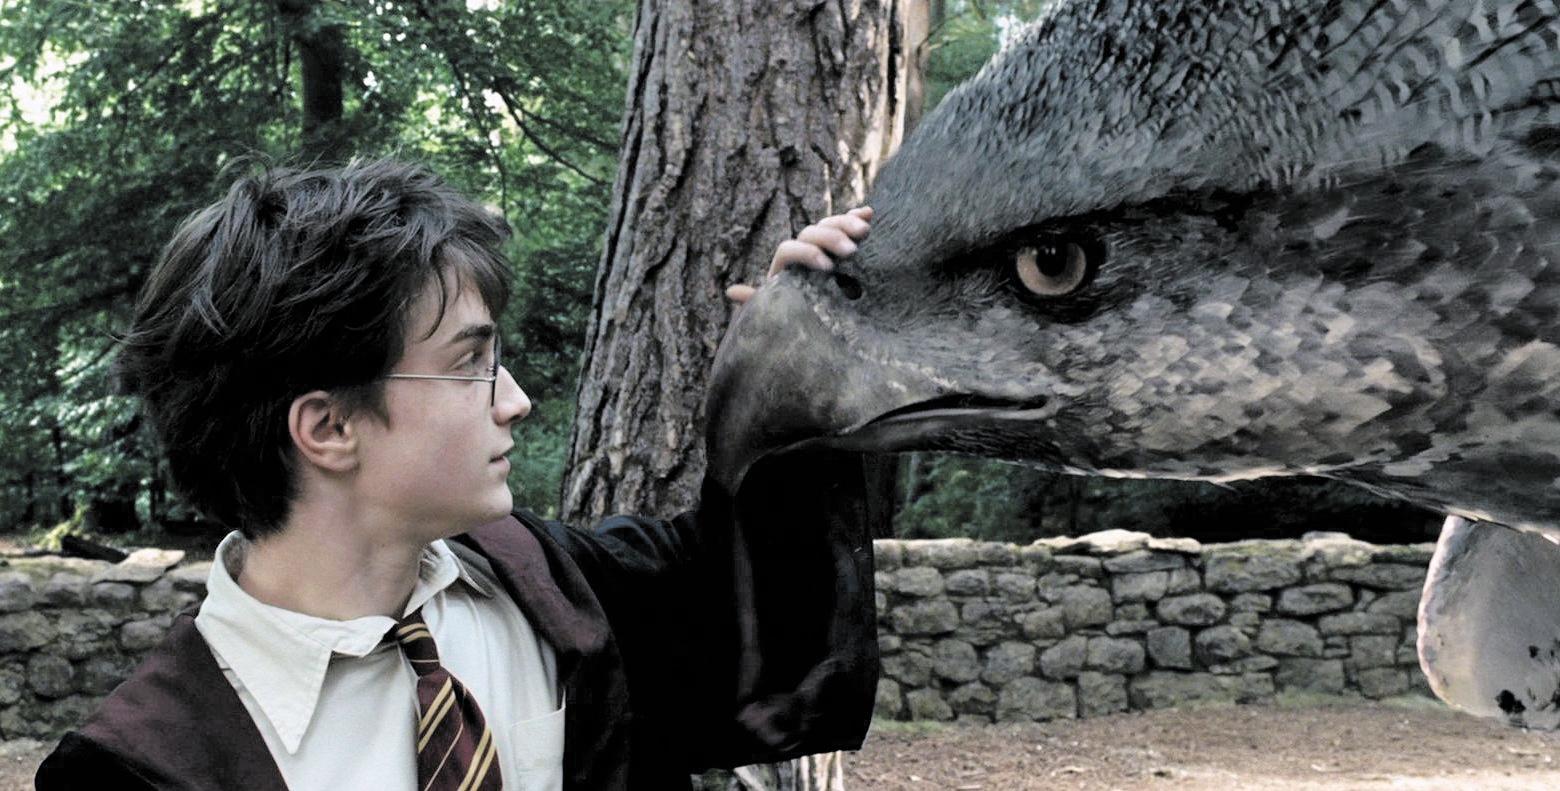 Гарри и гиппогриф Клювокрыл (кадр из фильма «Гарри Поттер и узник Азкабана»)